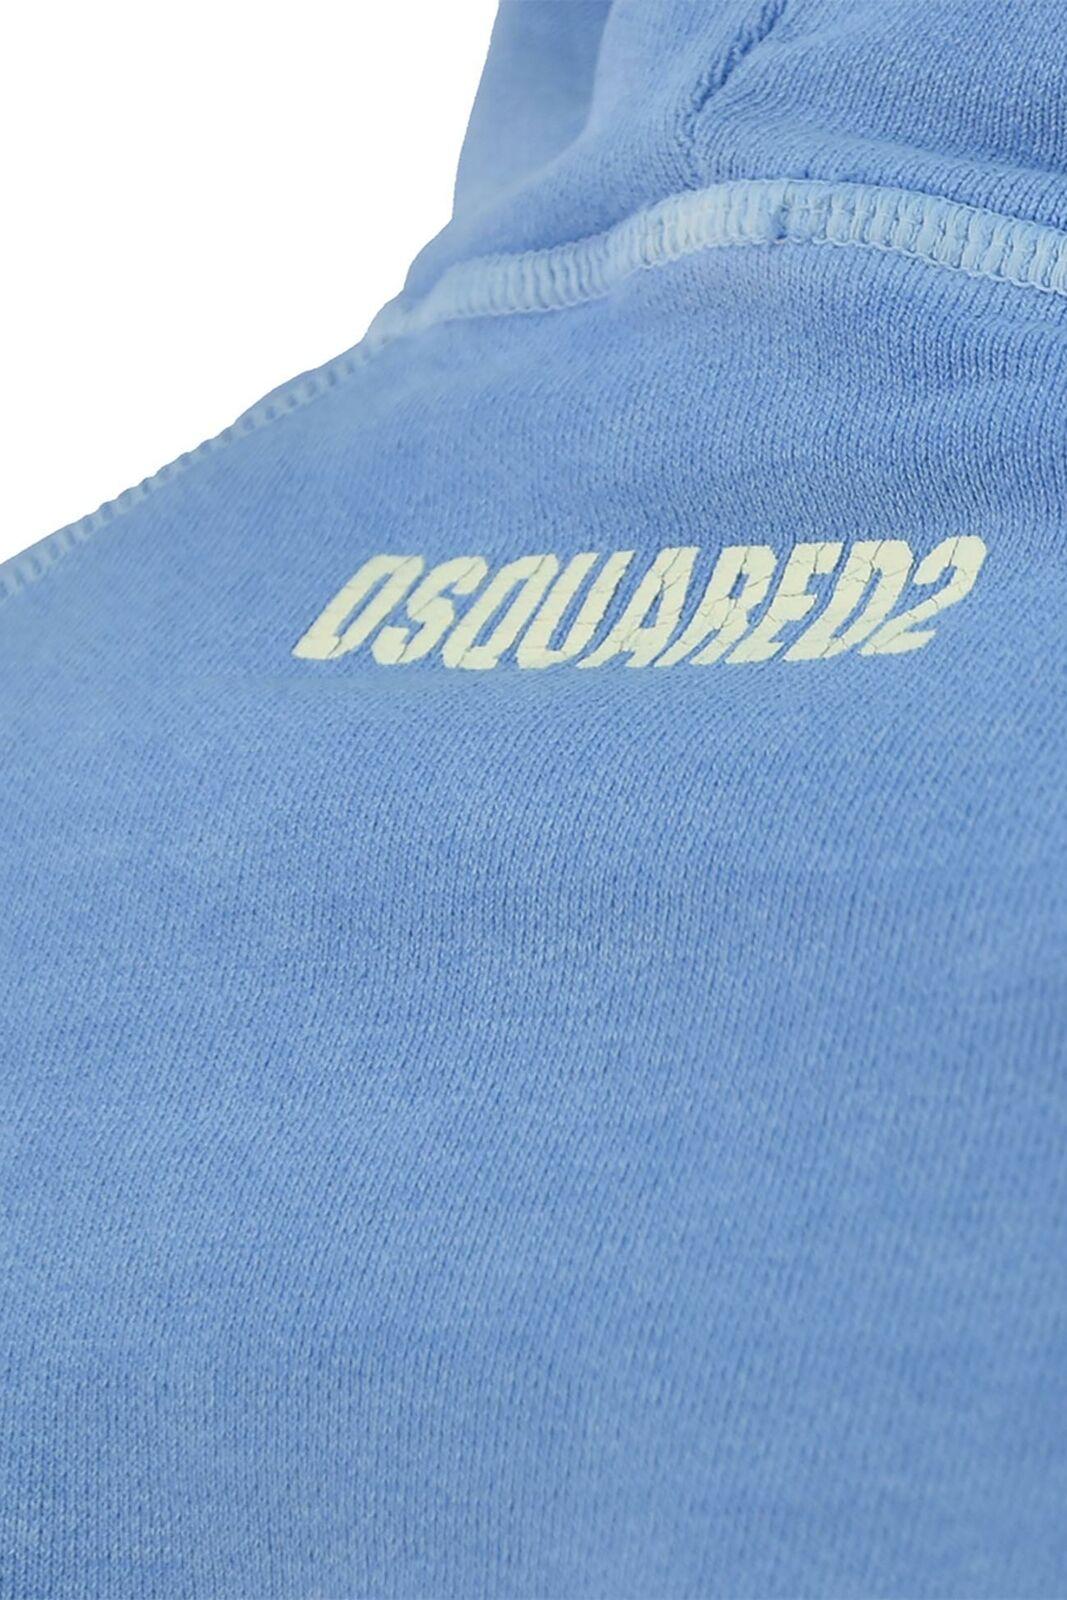 Dsquared2 Sweatshirt Blue Man Cotton Logo Mod.S74GU0056S25217471